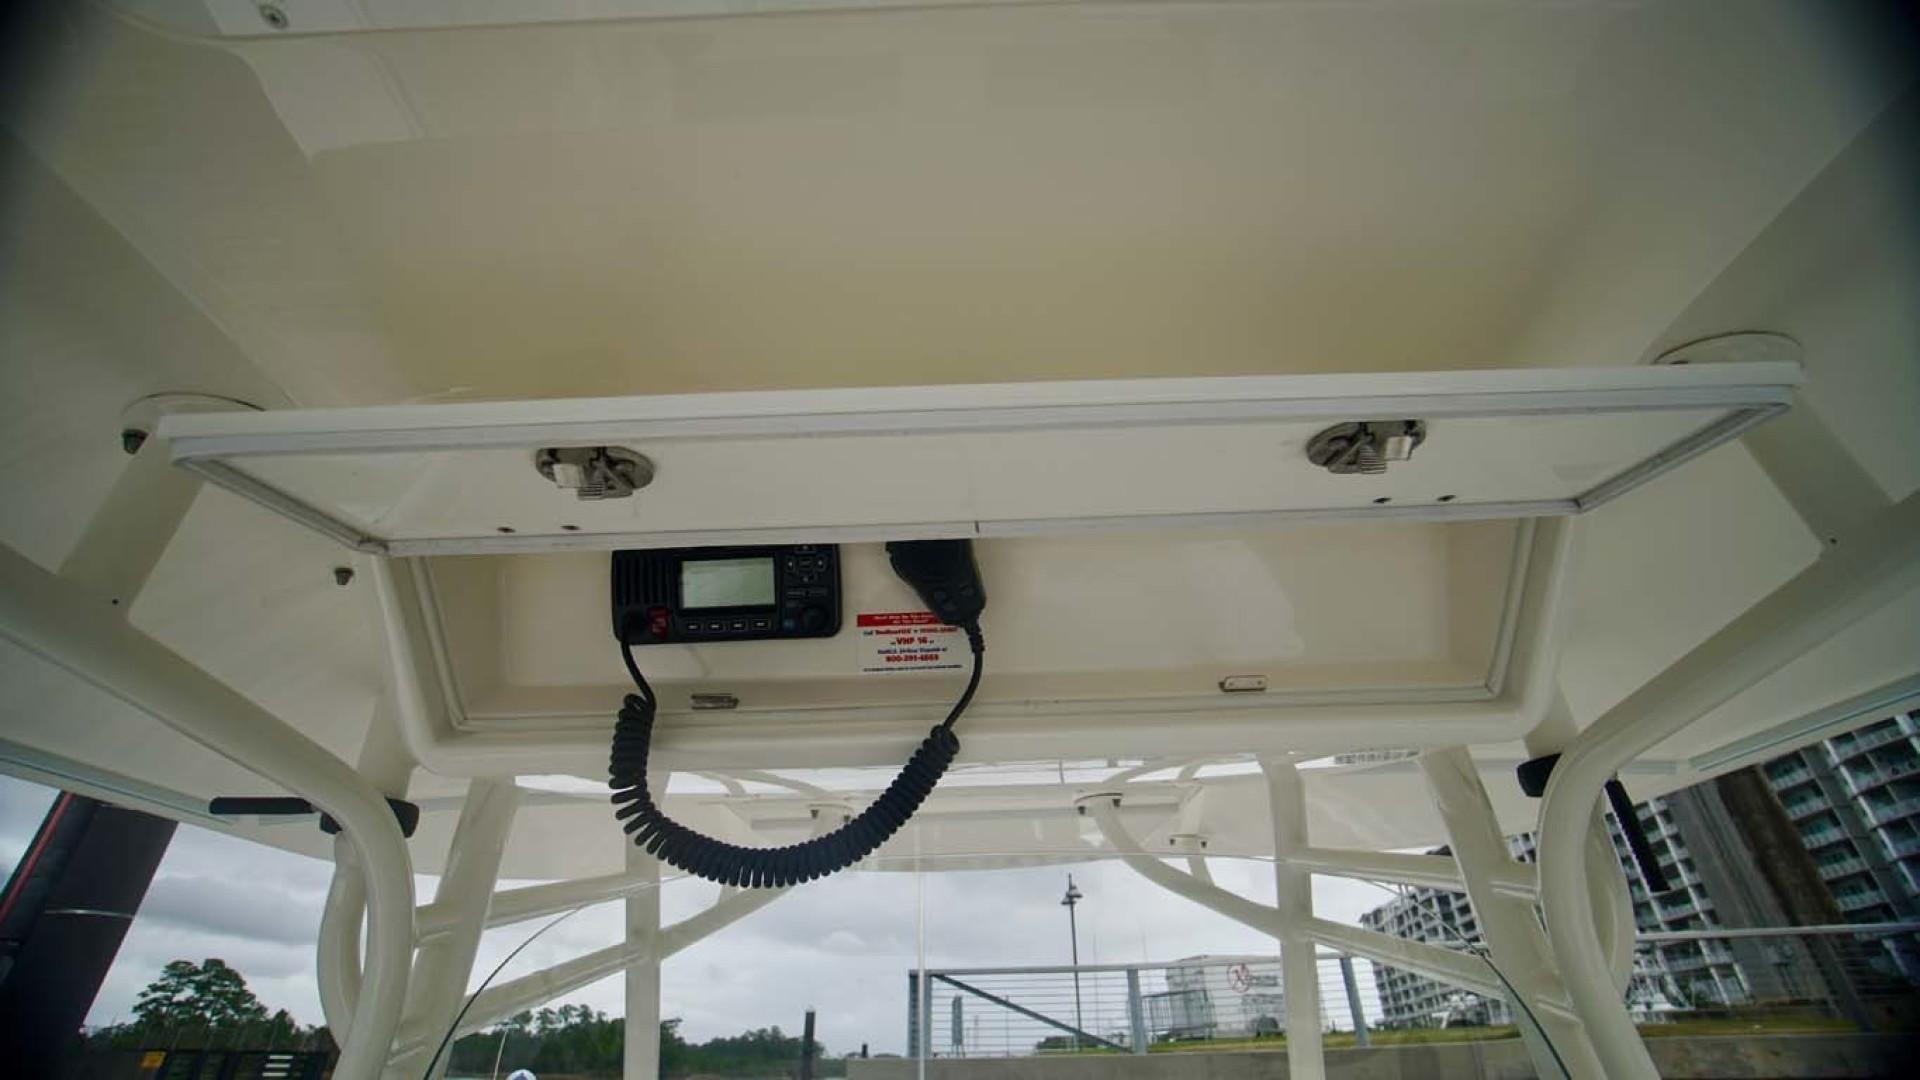 Regulator-34 2015 -Orange Beach-Alabama-United States-VHS In Overhead Compartment-1301947 | Thumbnail